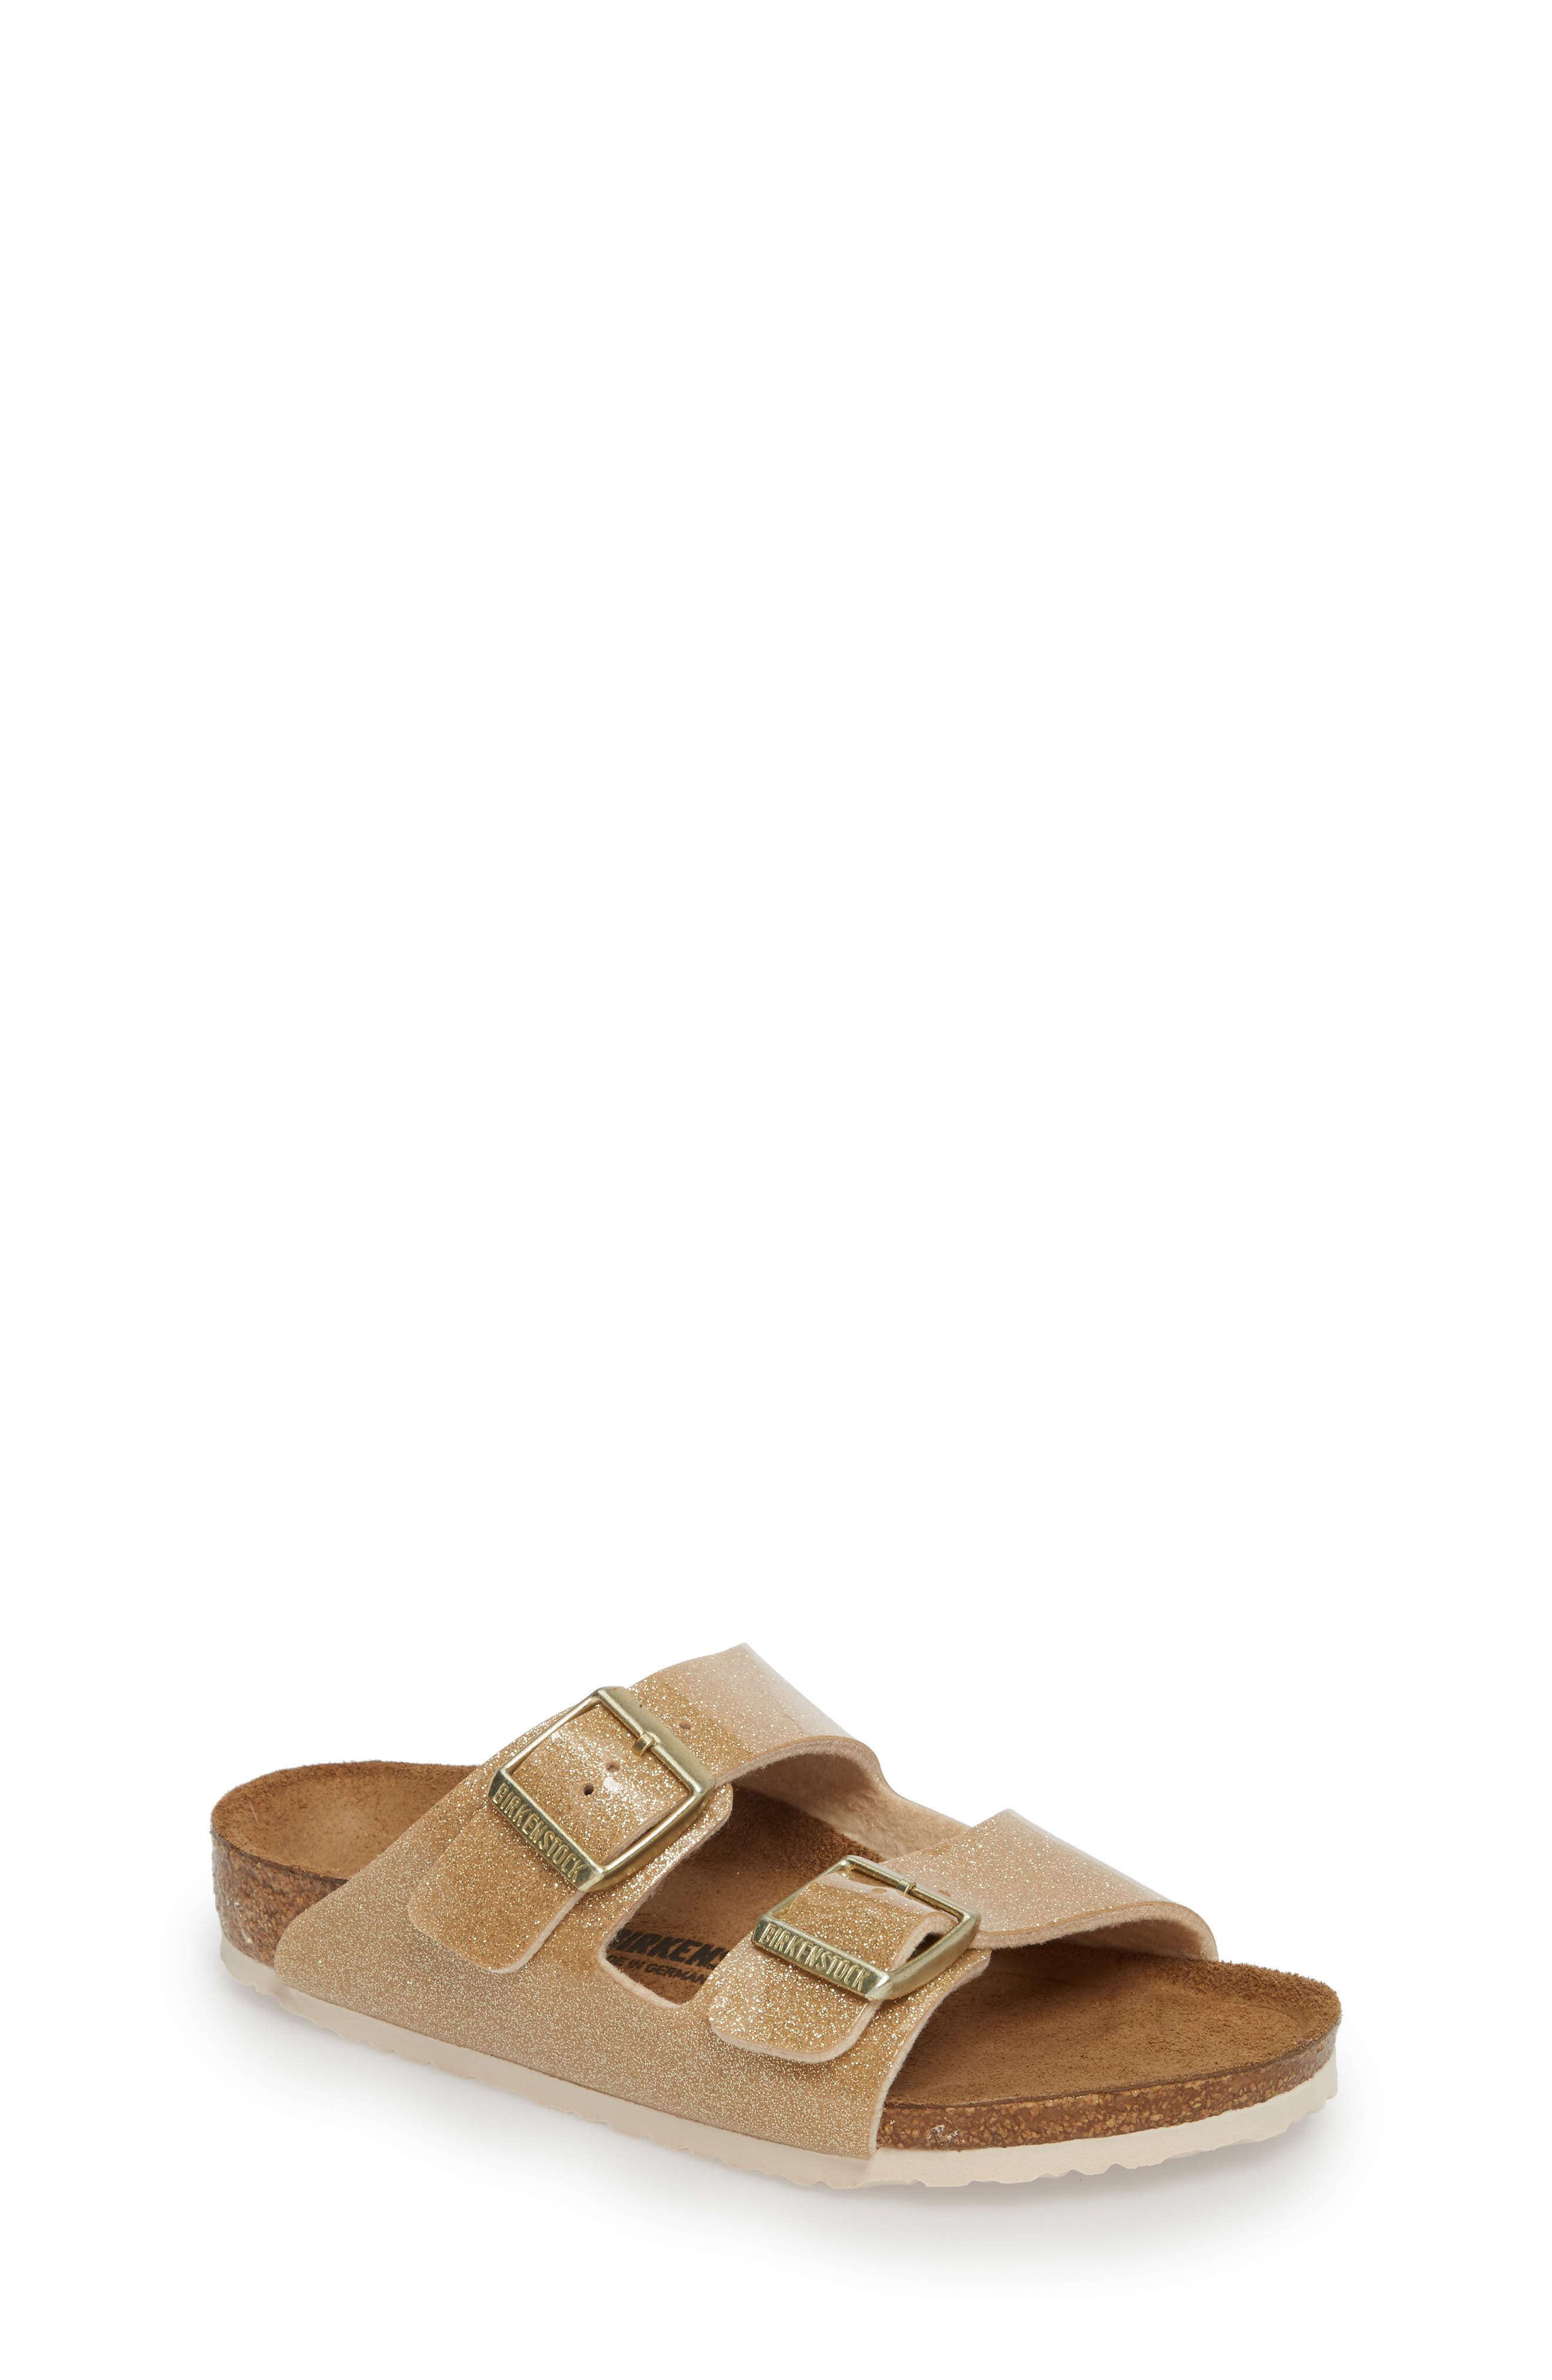 'Arizona Galaxy Birko-Flor' Slide Sandal,                             Main thumbnail 1, color,